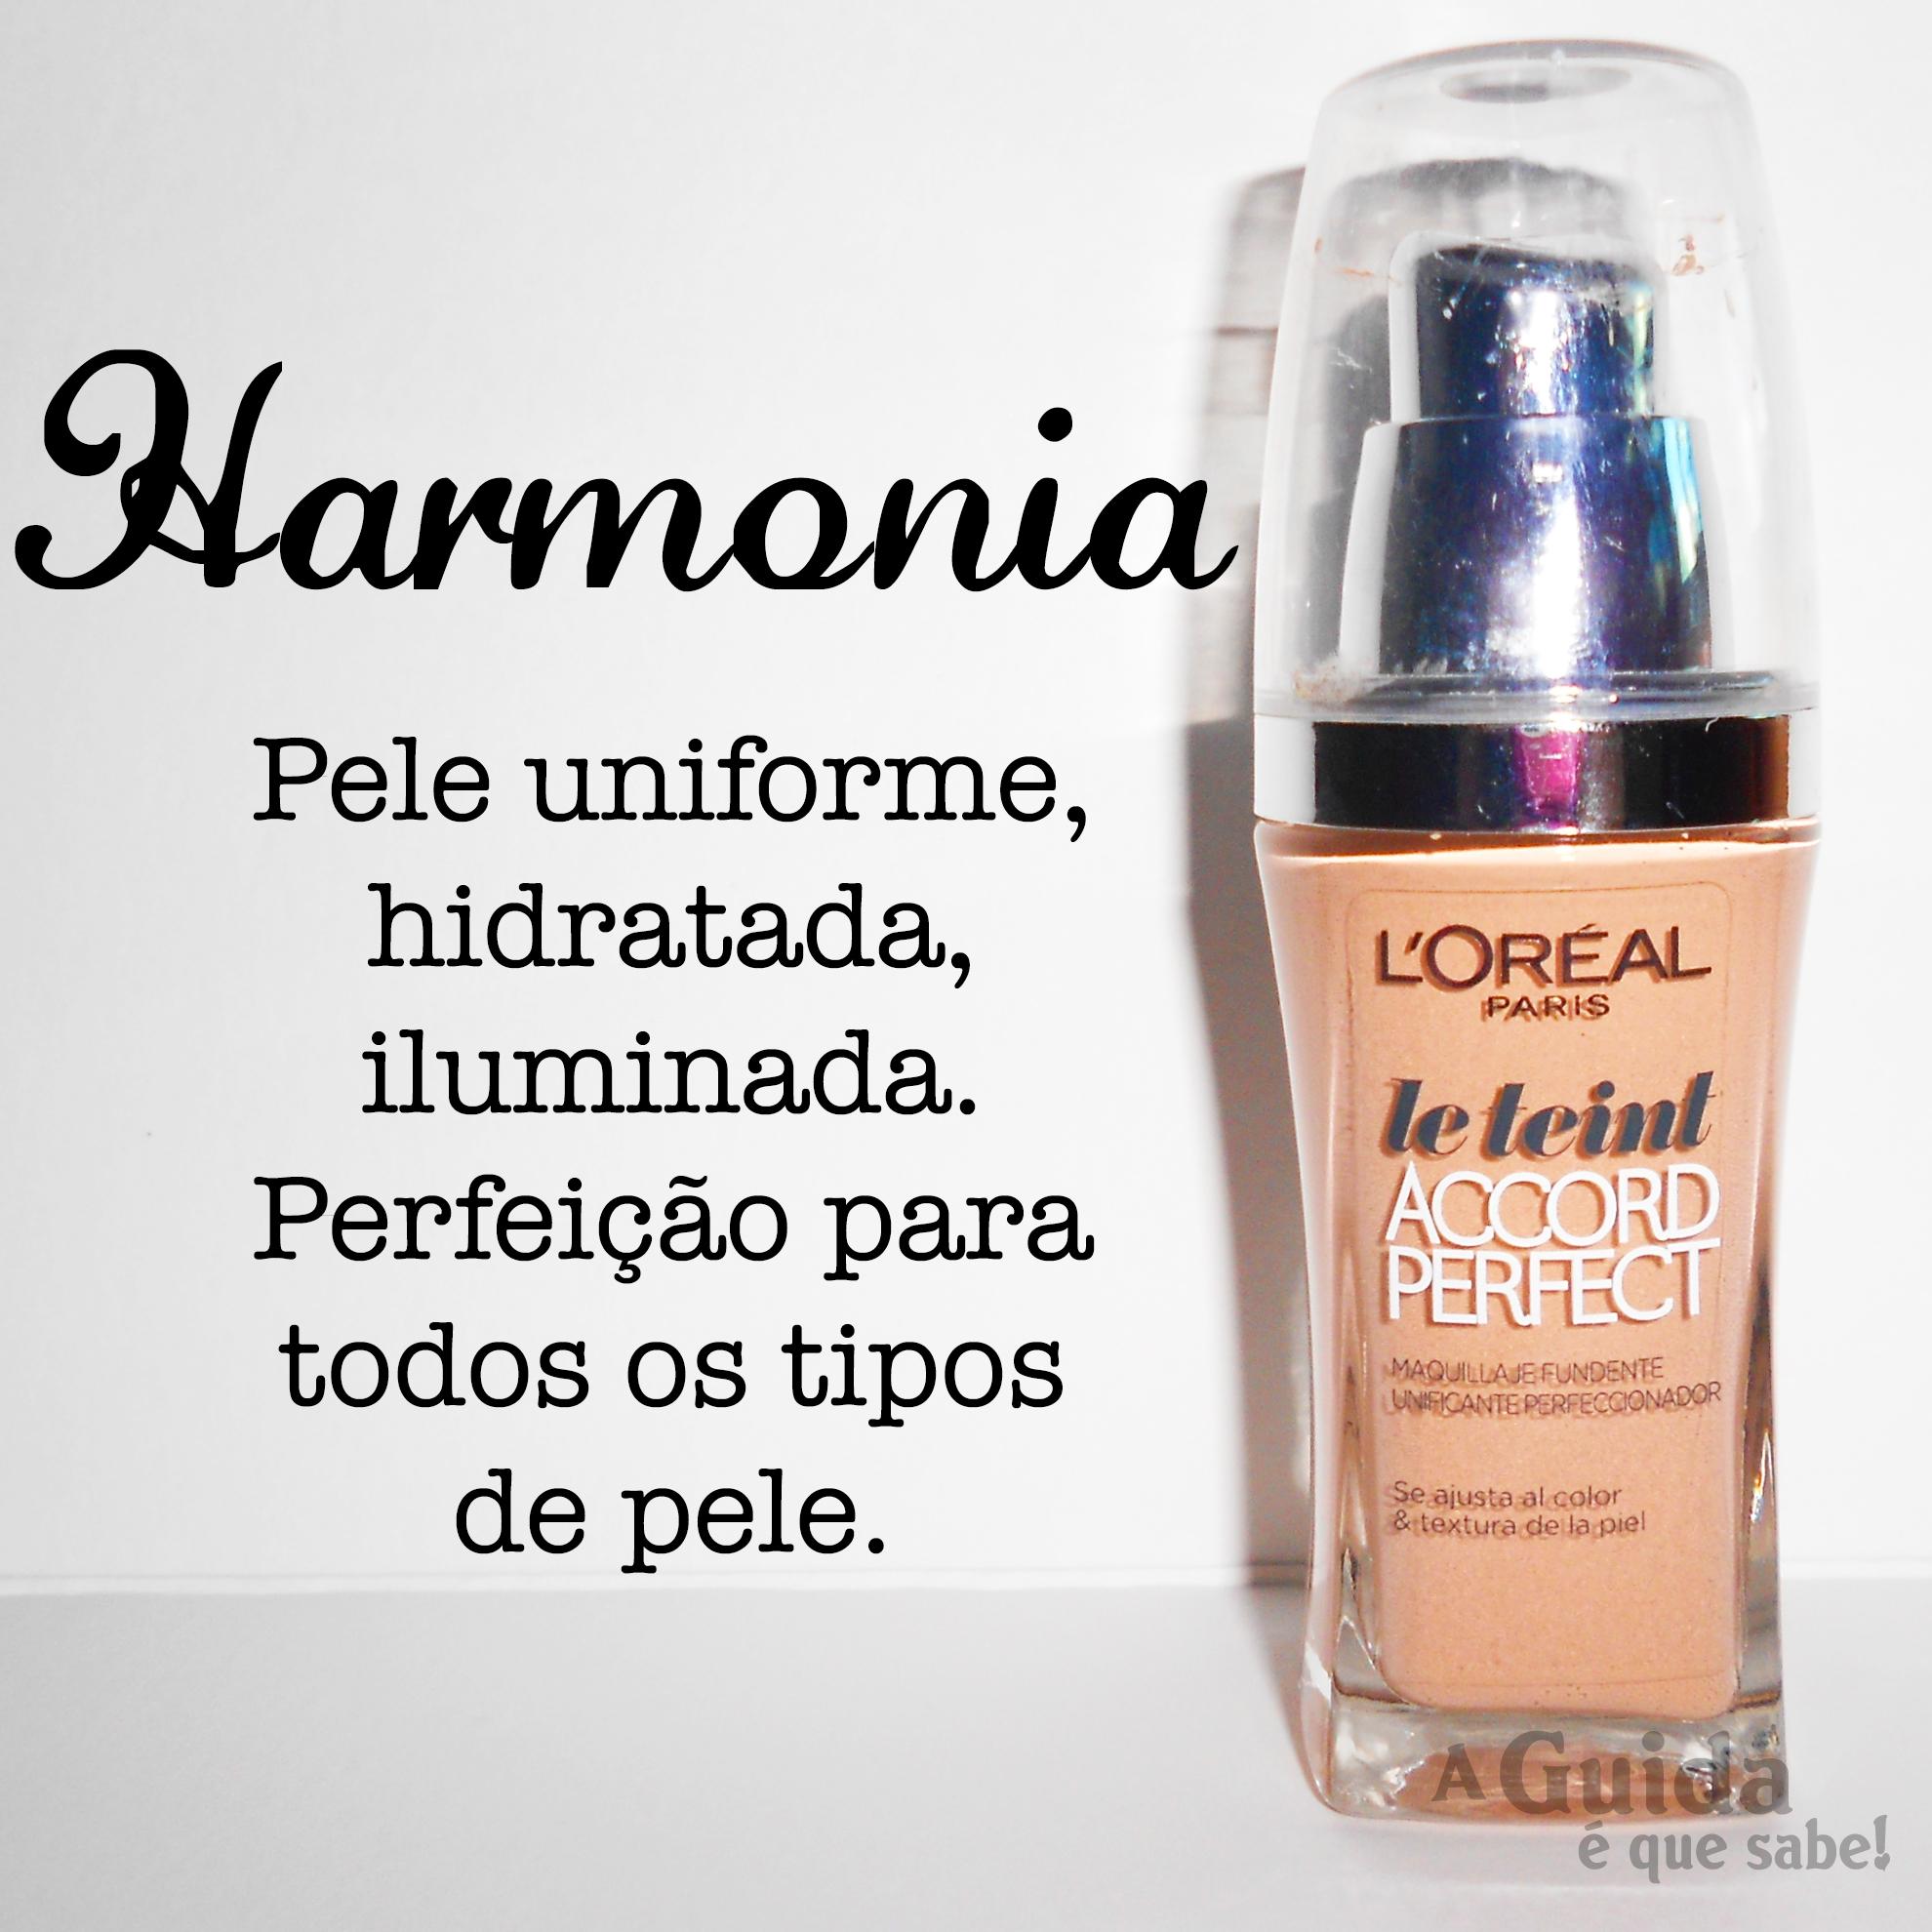 base fond de teint accord perfect l'oreal loreal paris portugal swatch review resenha makeup maquilhagem